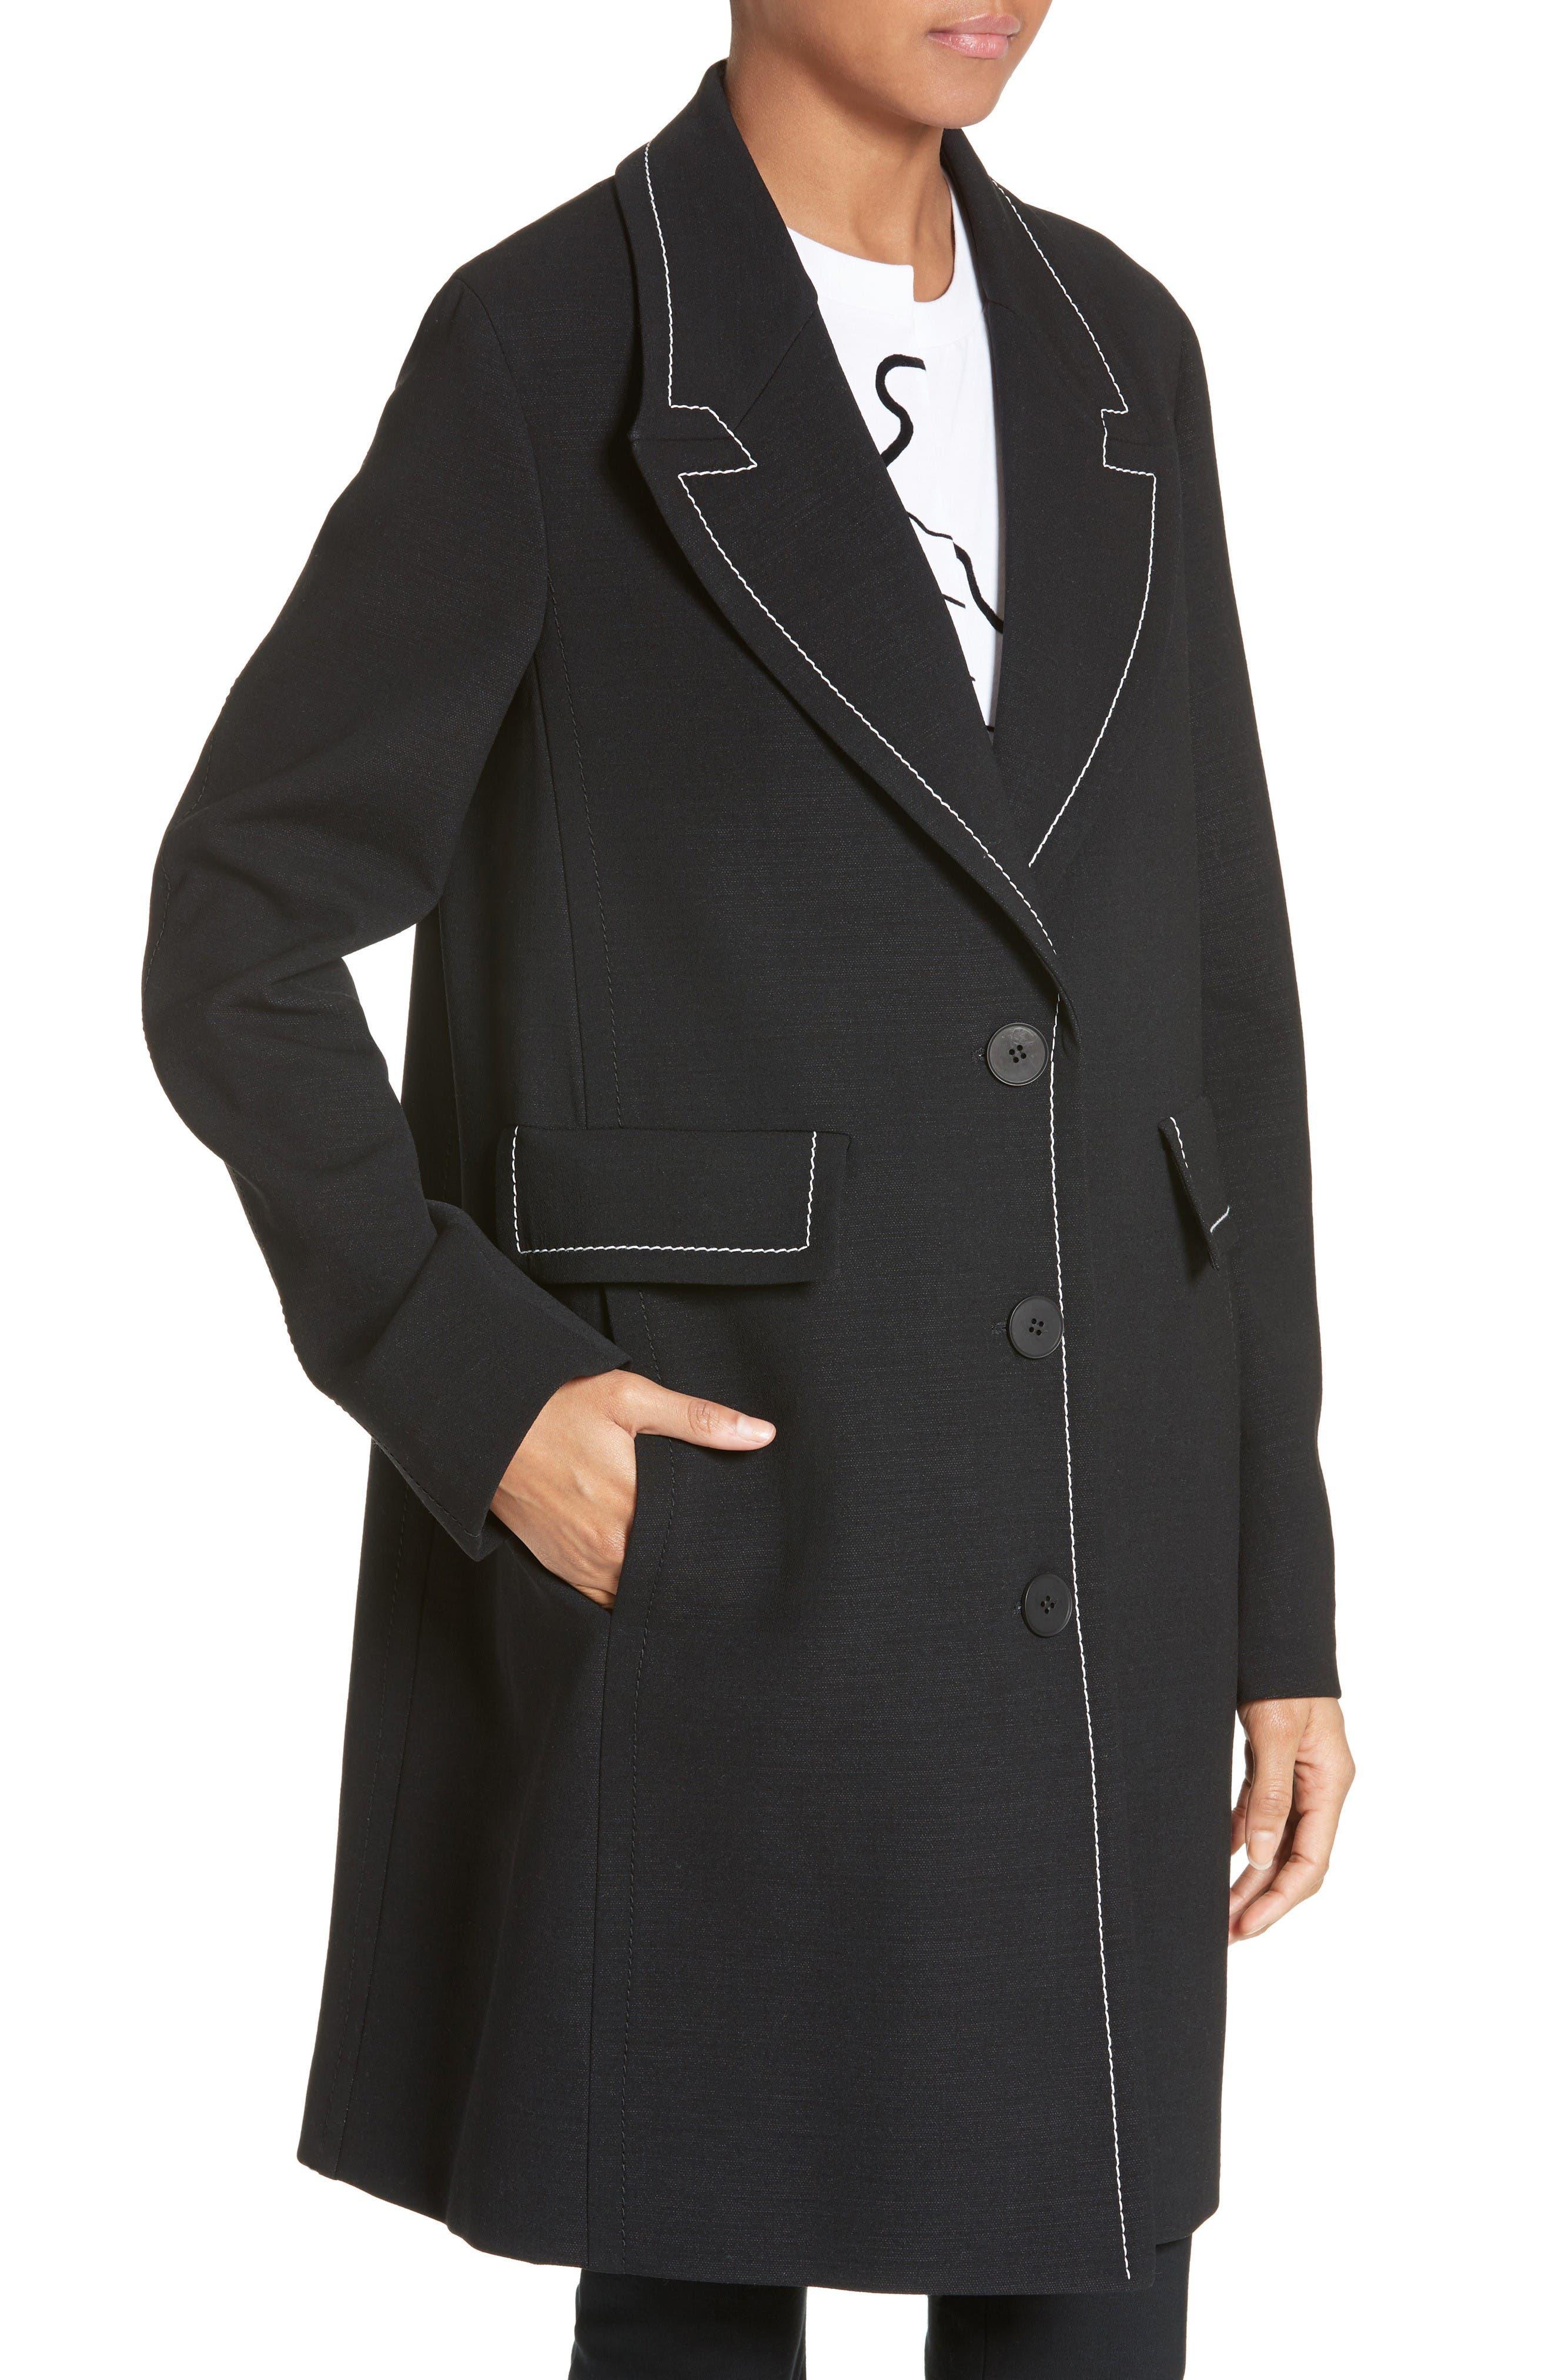 Marcelline Topstitch Double Face Wool Coat,                             Alternate thumbnail 6, color,                             Black/ Mistletoe